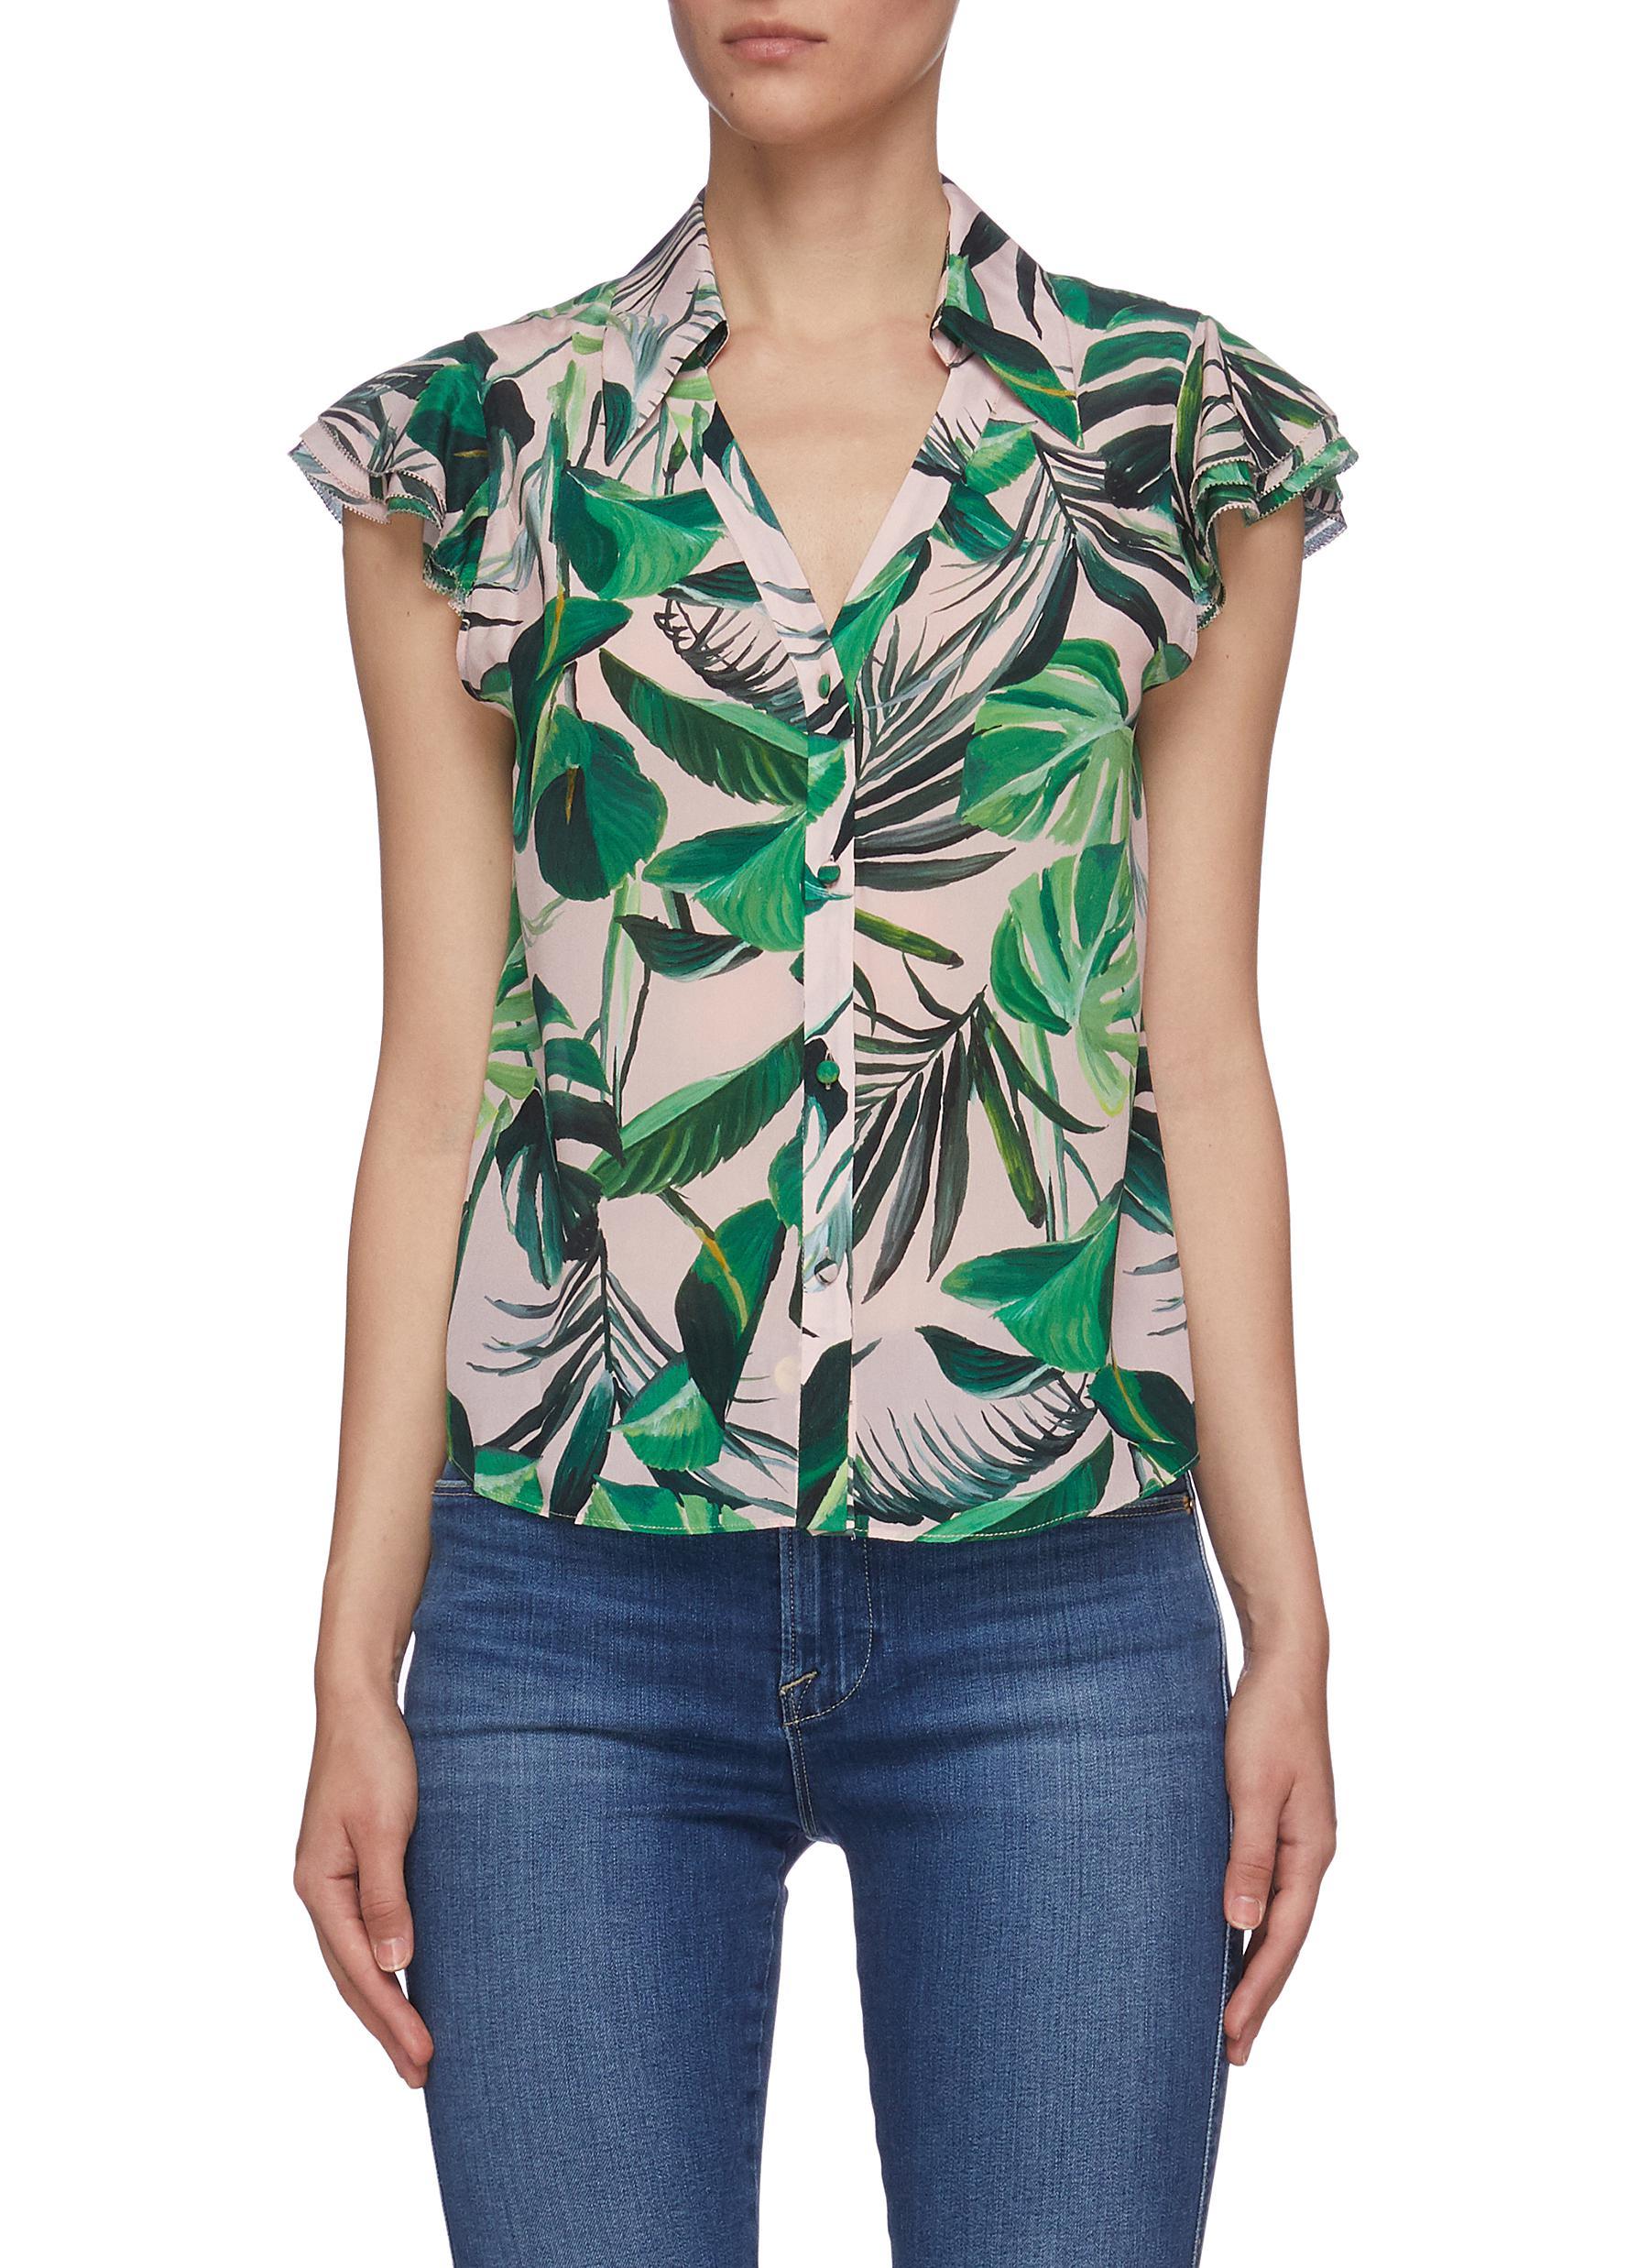 Randa' palm print ruffle sleeve silk henley shirt - ALICE + OLIVIA - Modalova